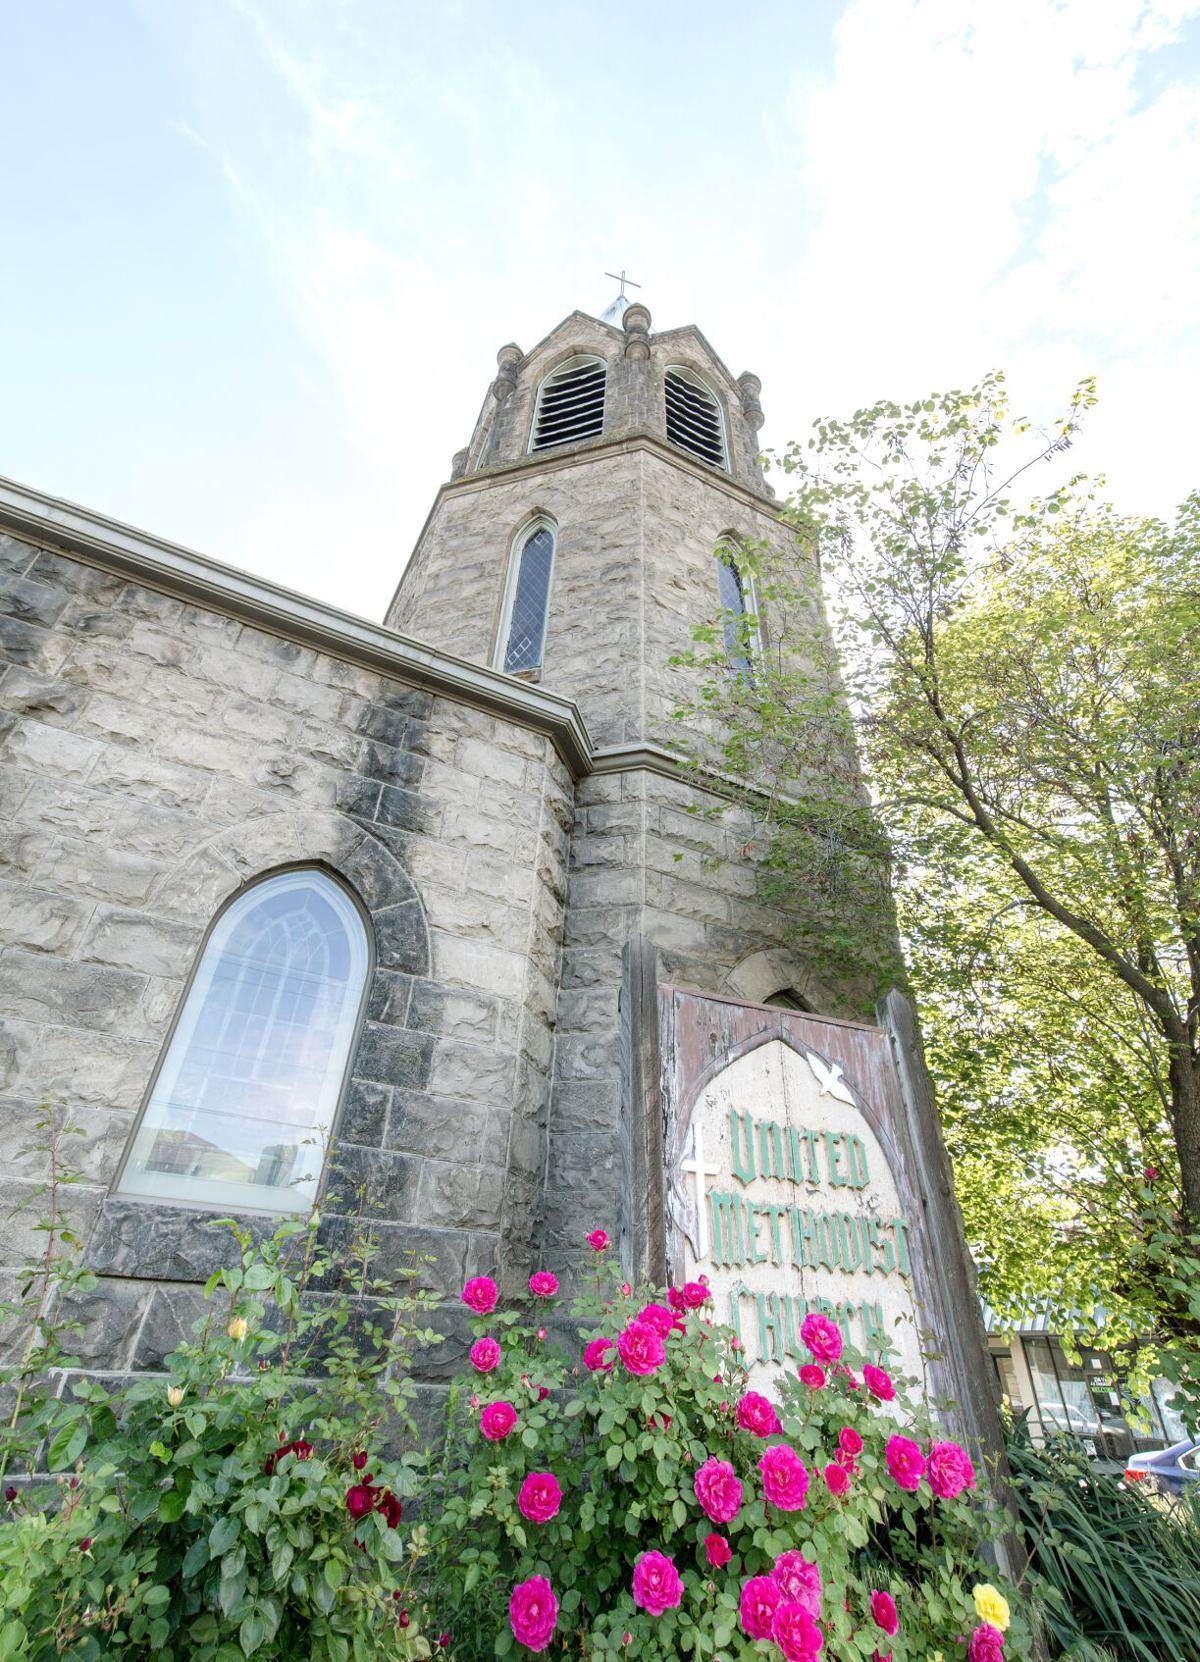 Church disbands